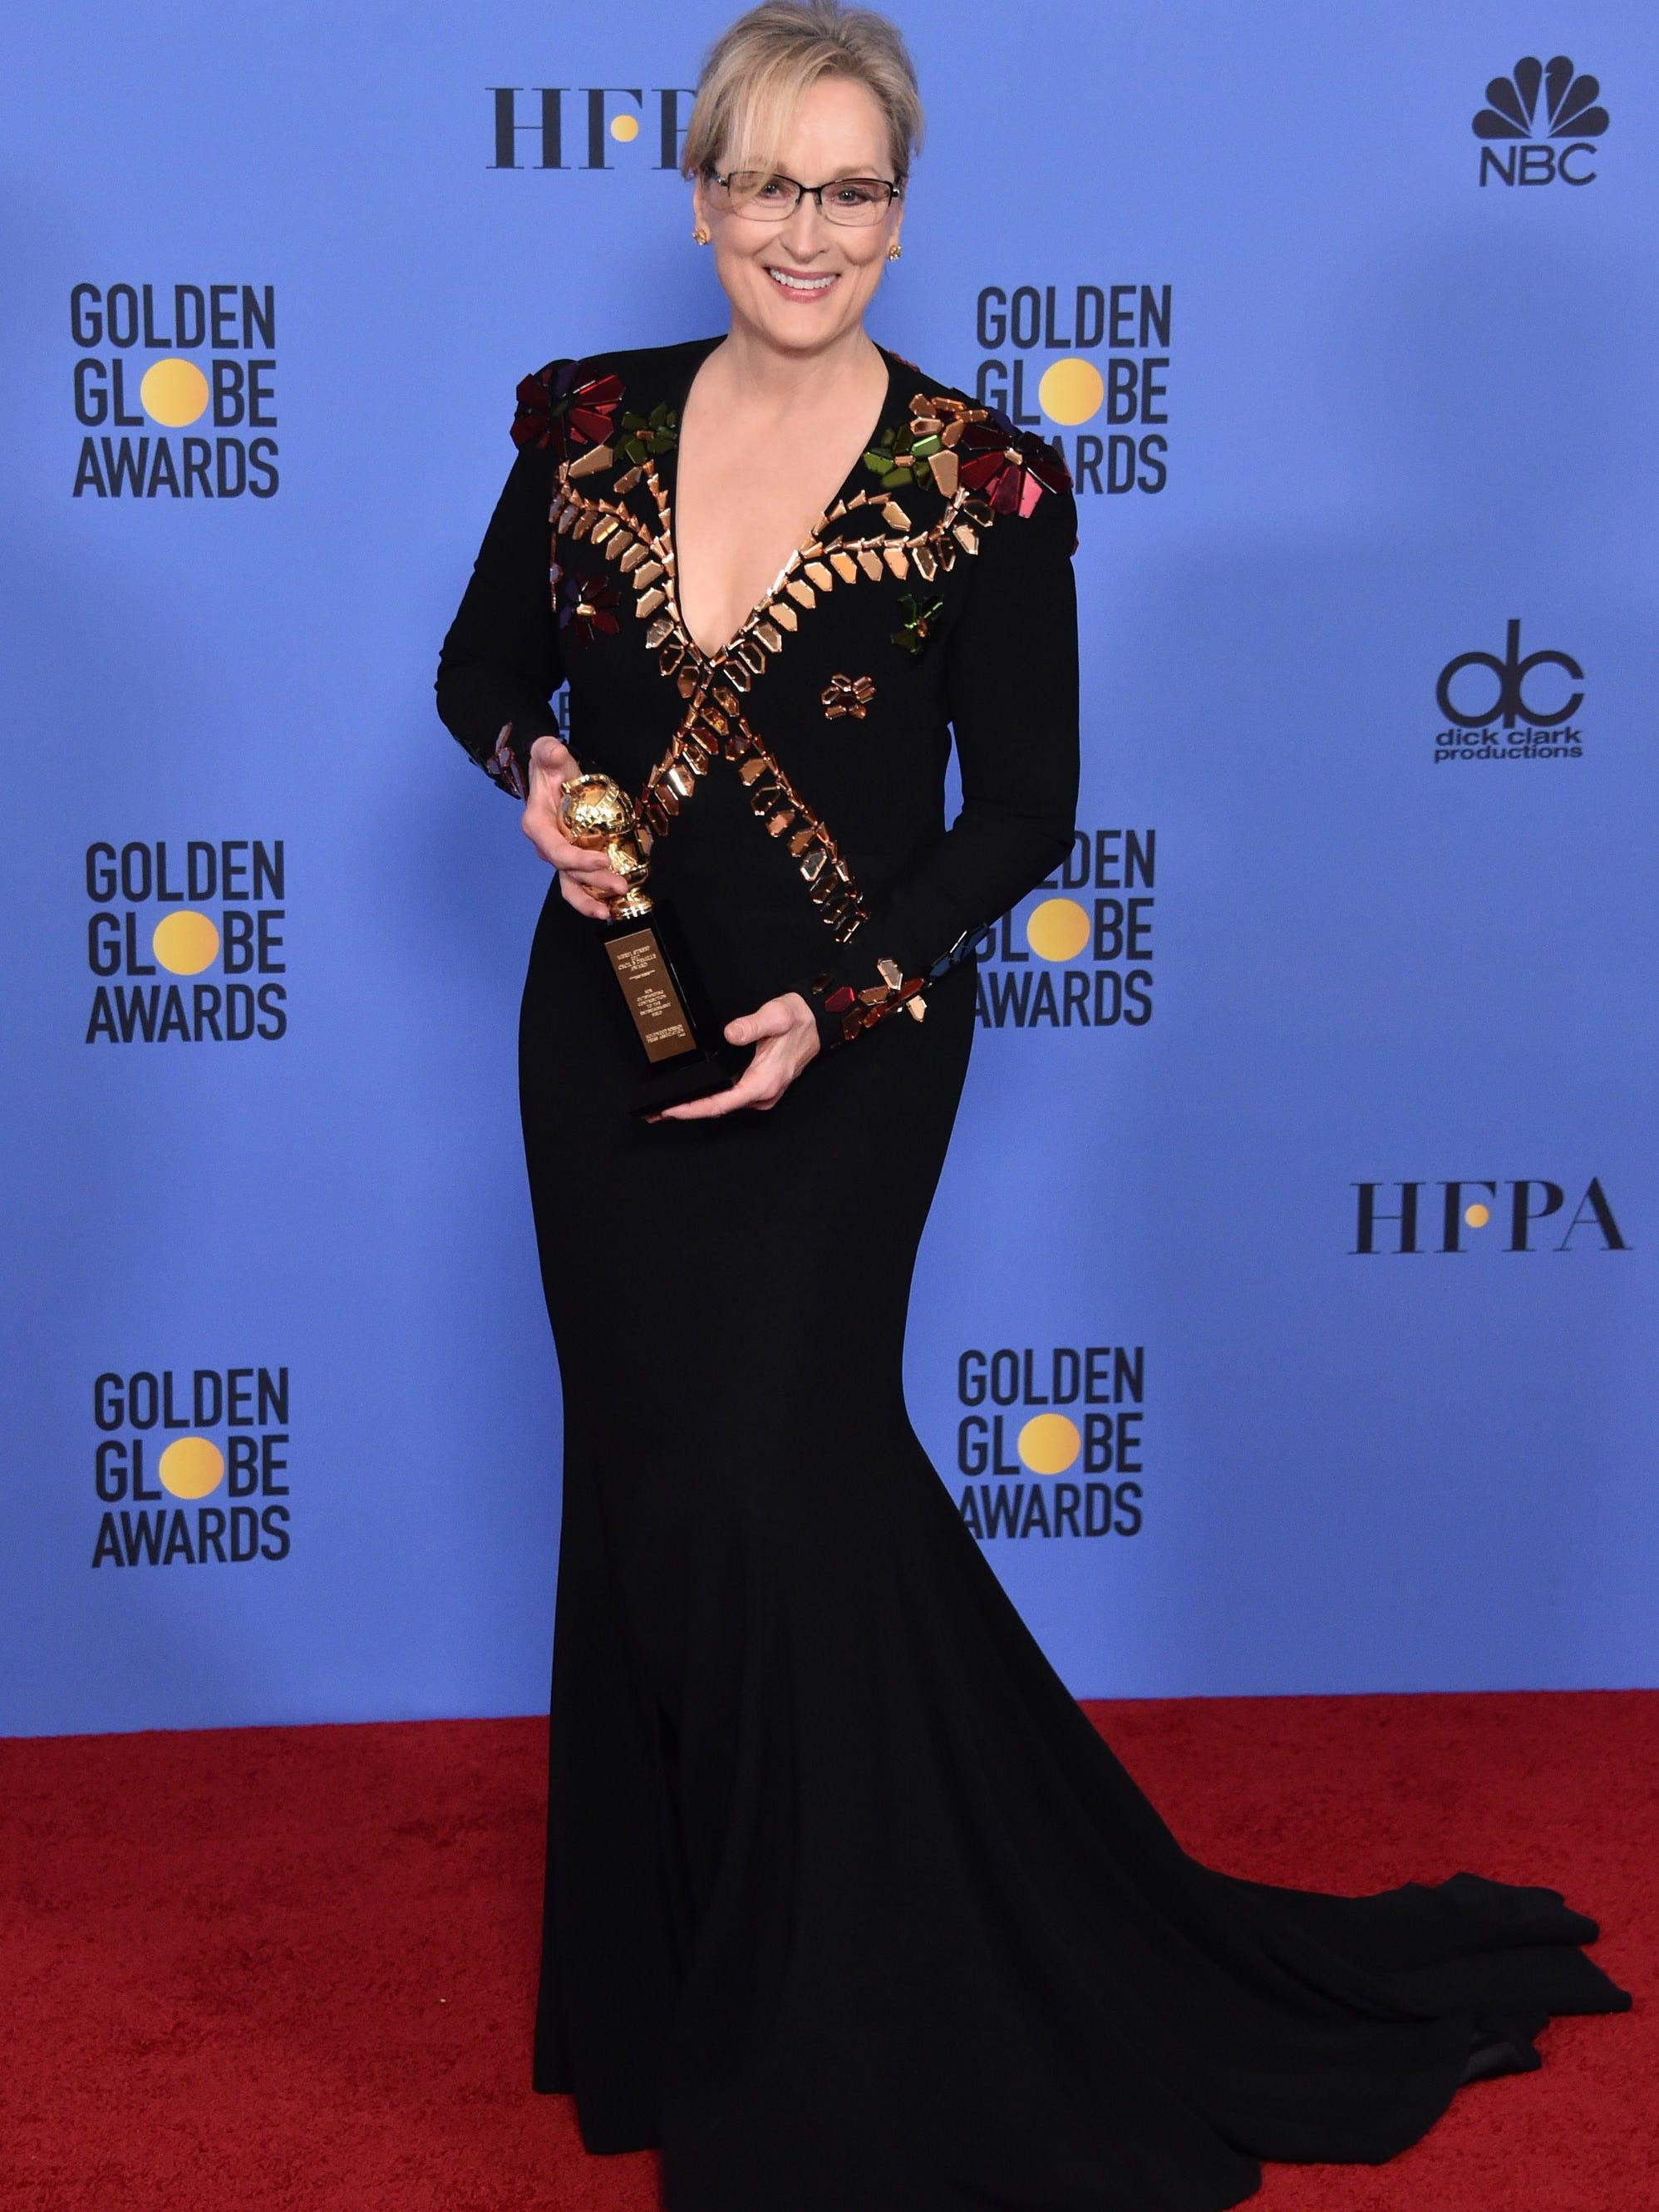 Meryl Streep ruined the Golden Globes